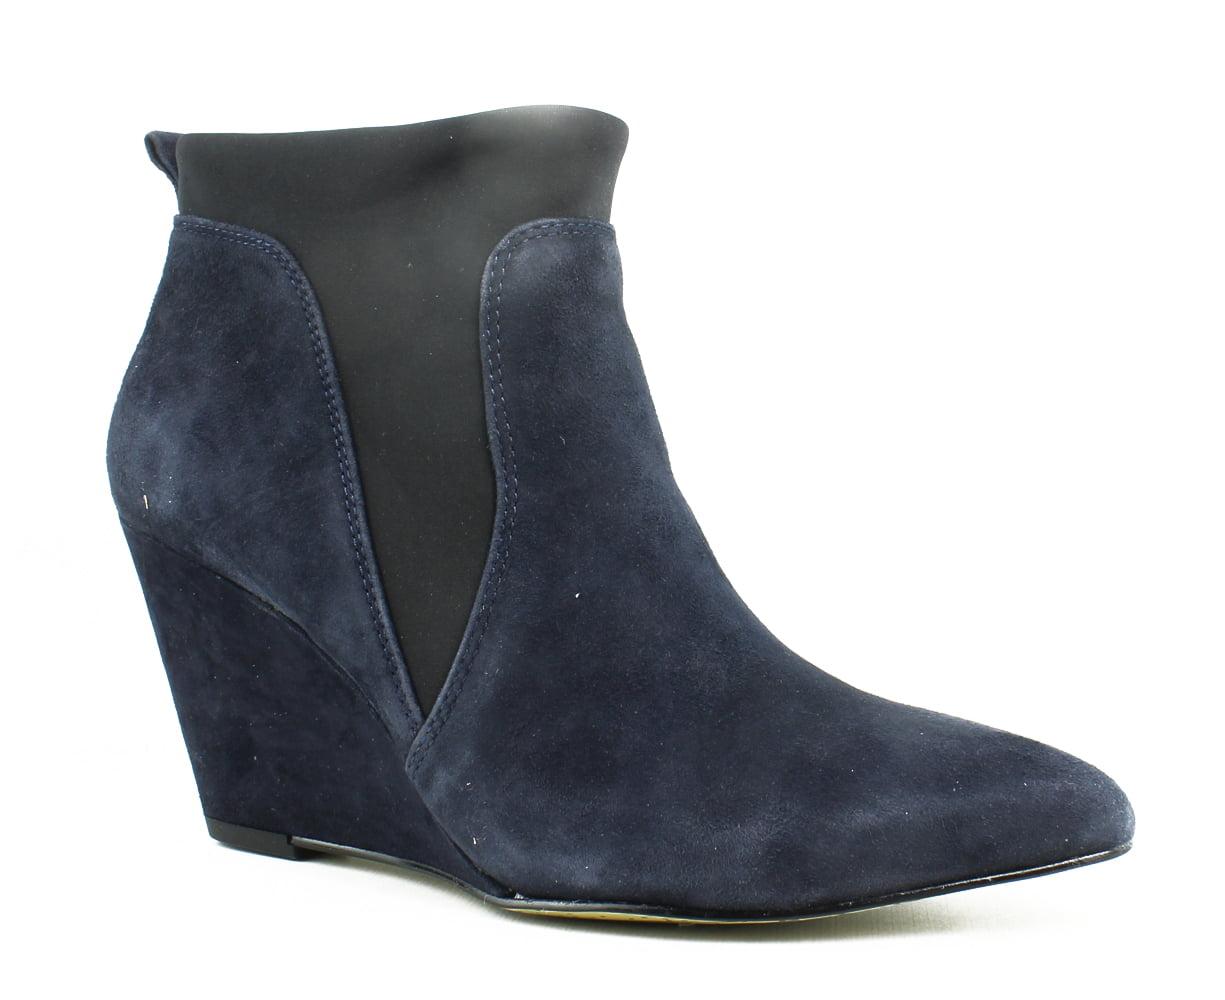 New Bella Vita Womens Deryn NavySuede BlackGore Ankle Boots Size 6 (AA,N) by Bella Vita